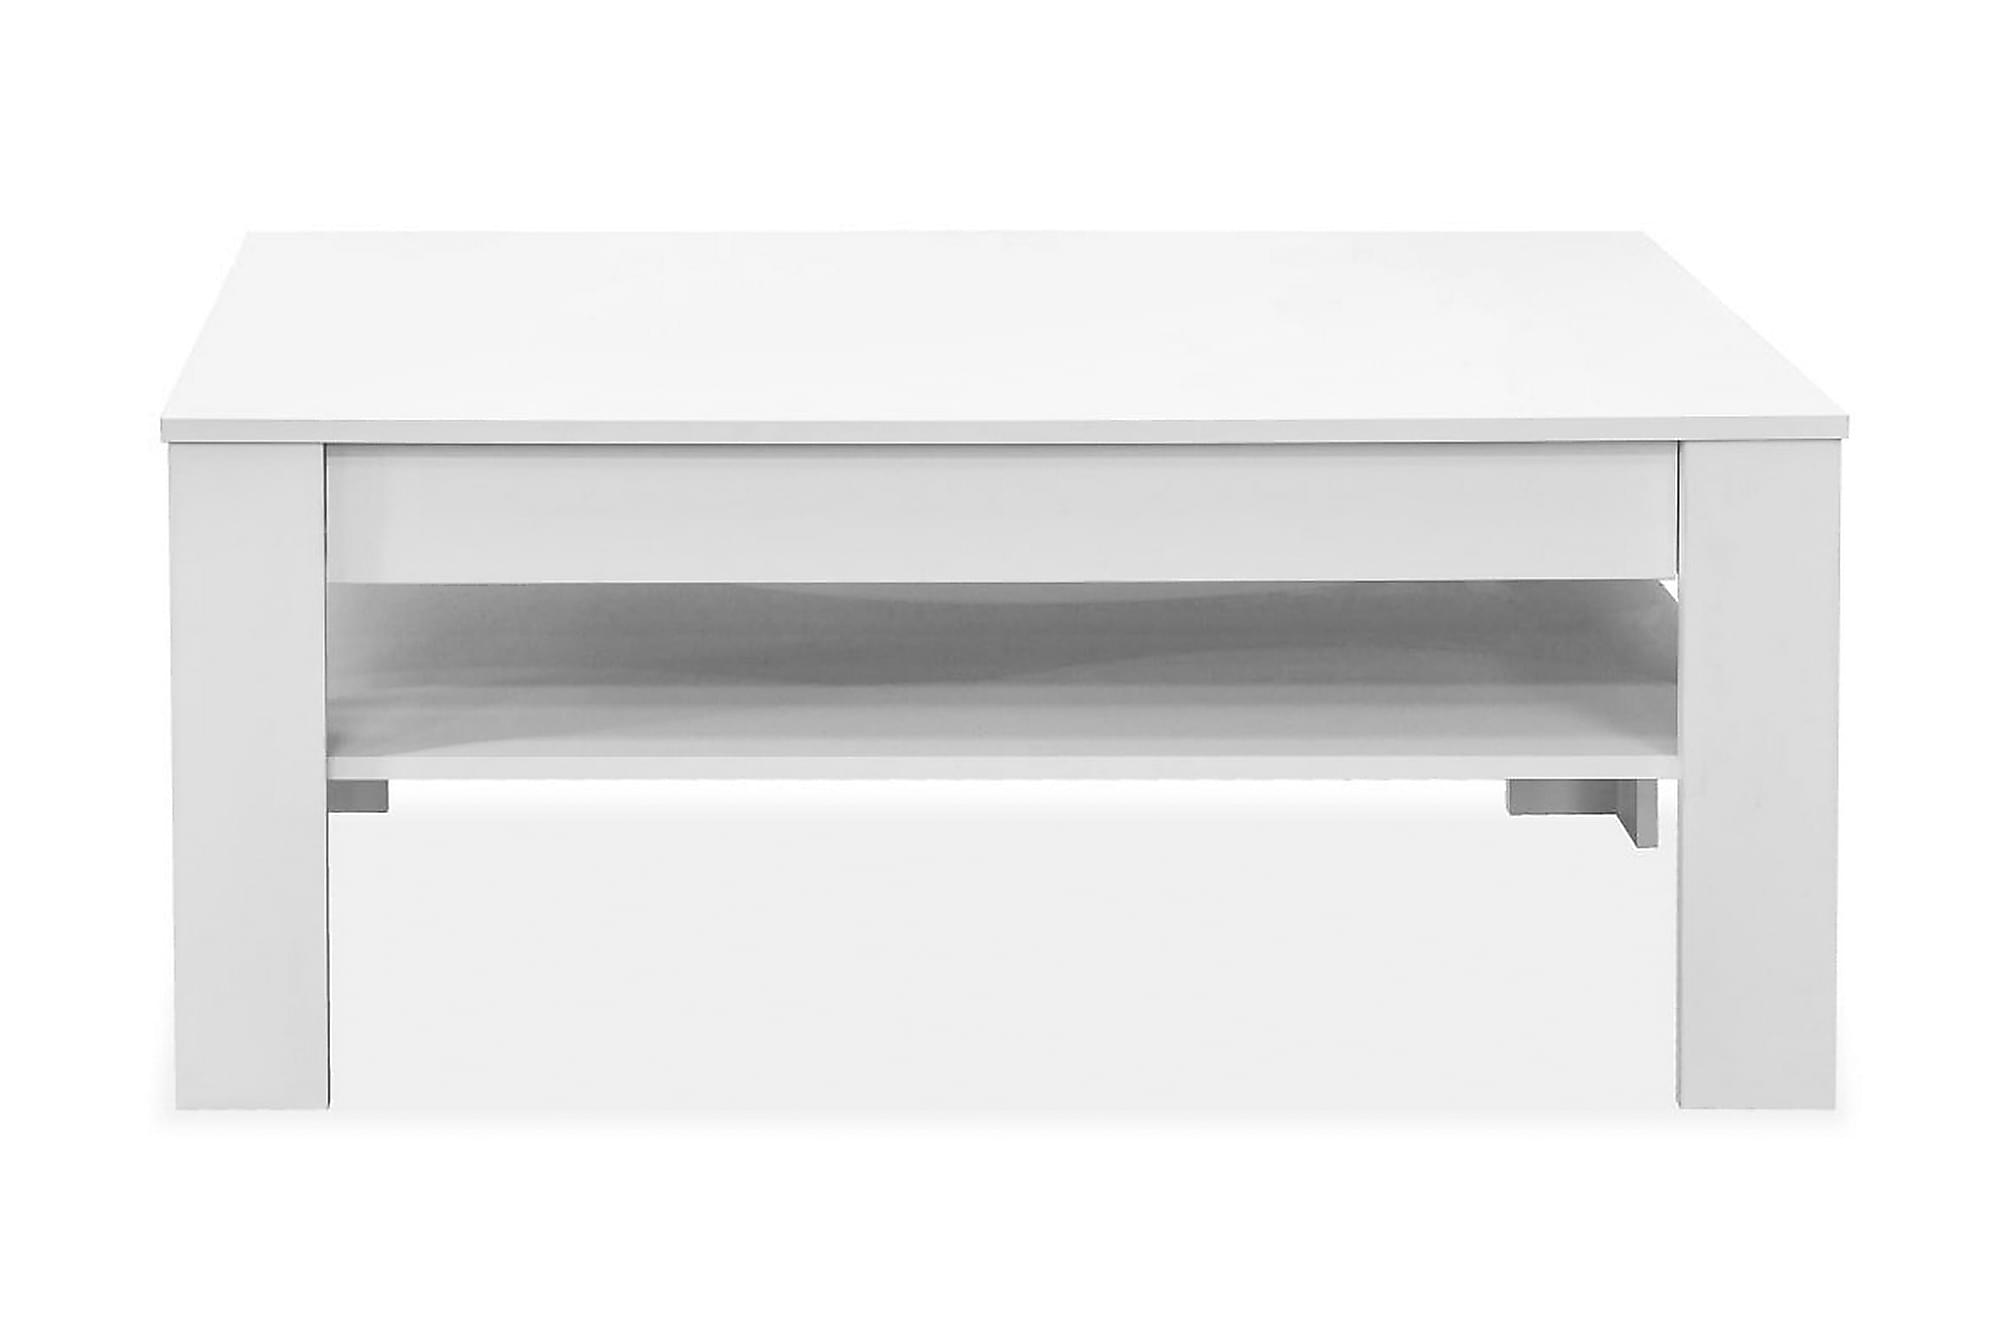 Soffbord spånskiva 110x65x48 cm vit